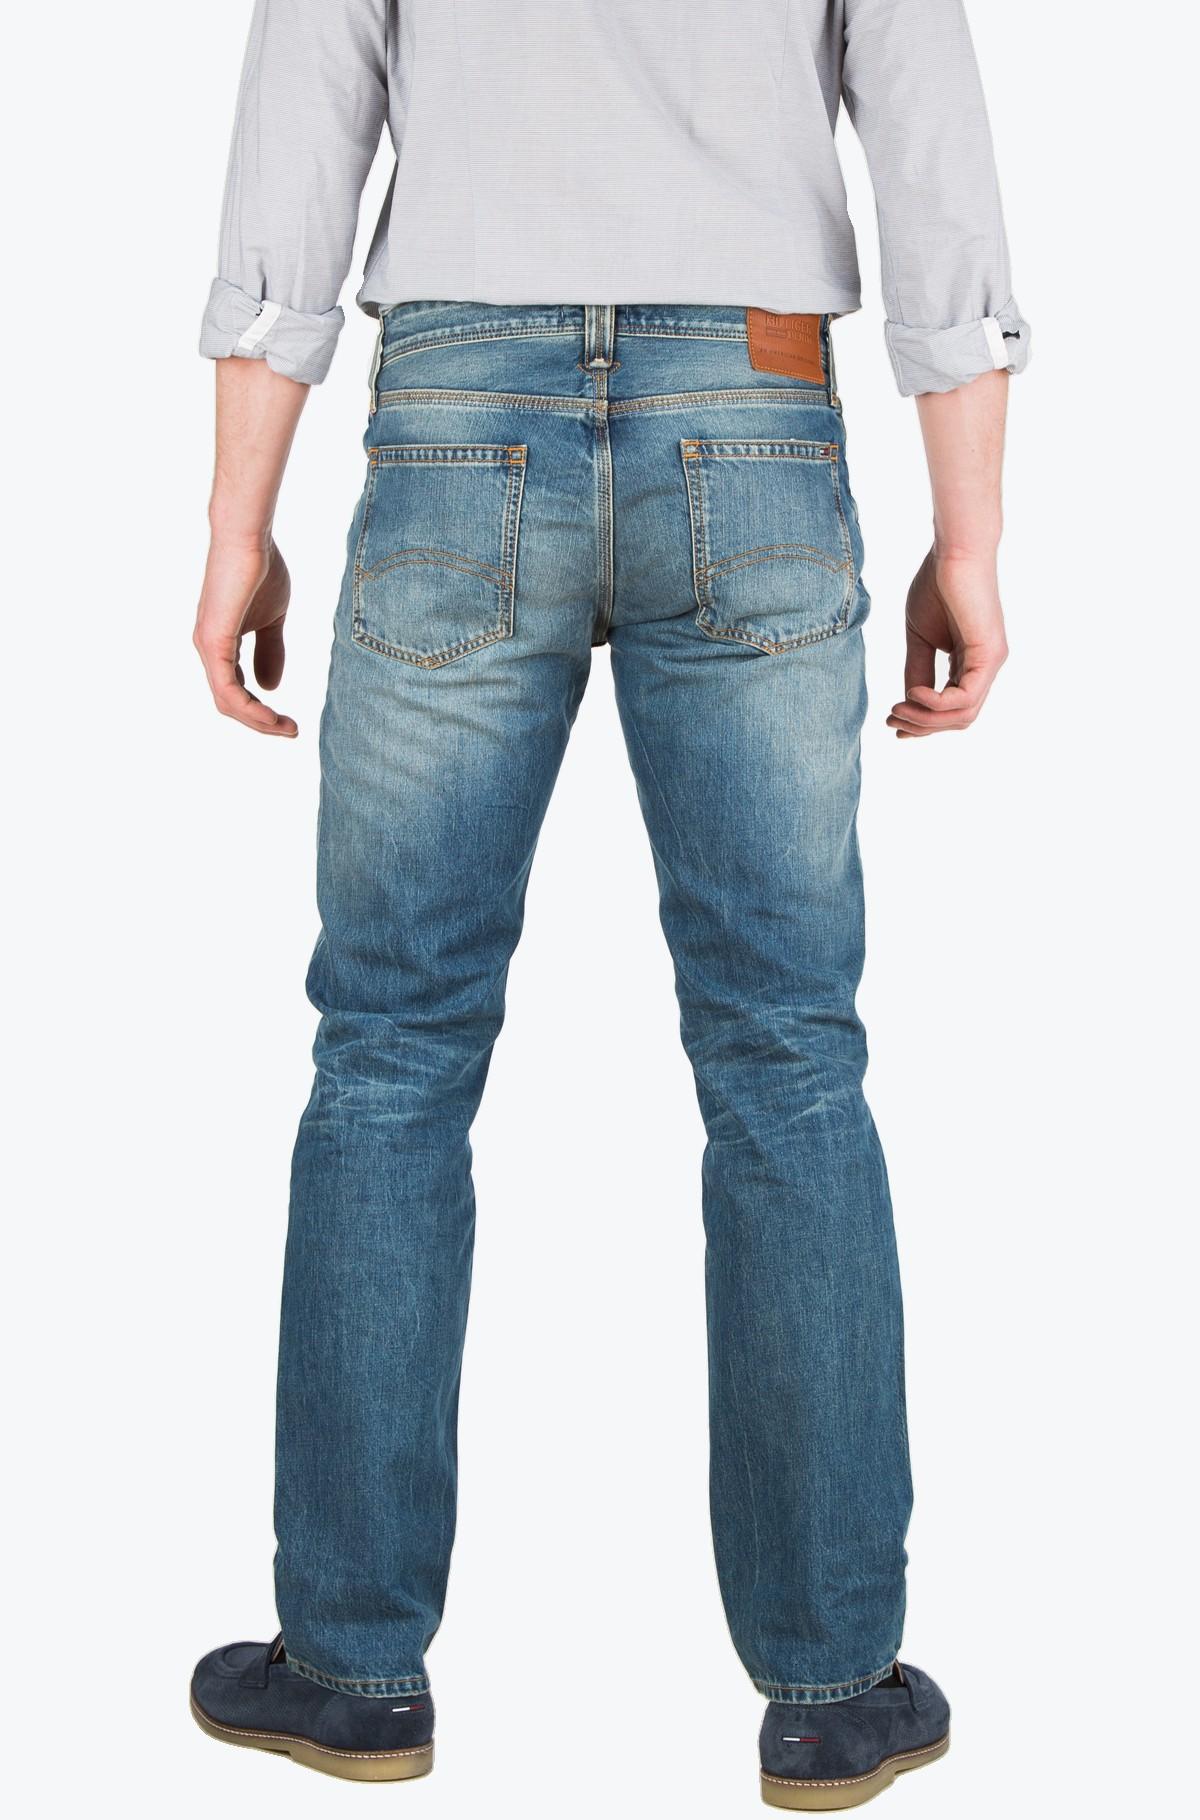 6f08f7269 Jeans Straight Ryan Pem Tommy Hilfiger, Mens Jeans | Denim Dream E-pood